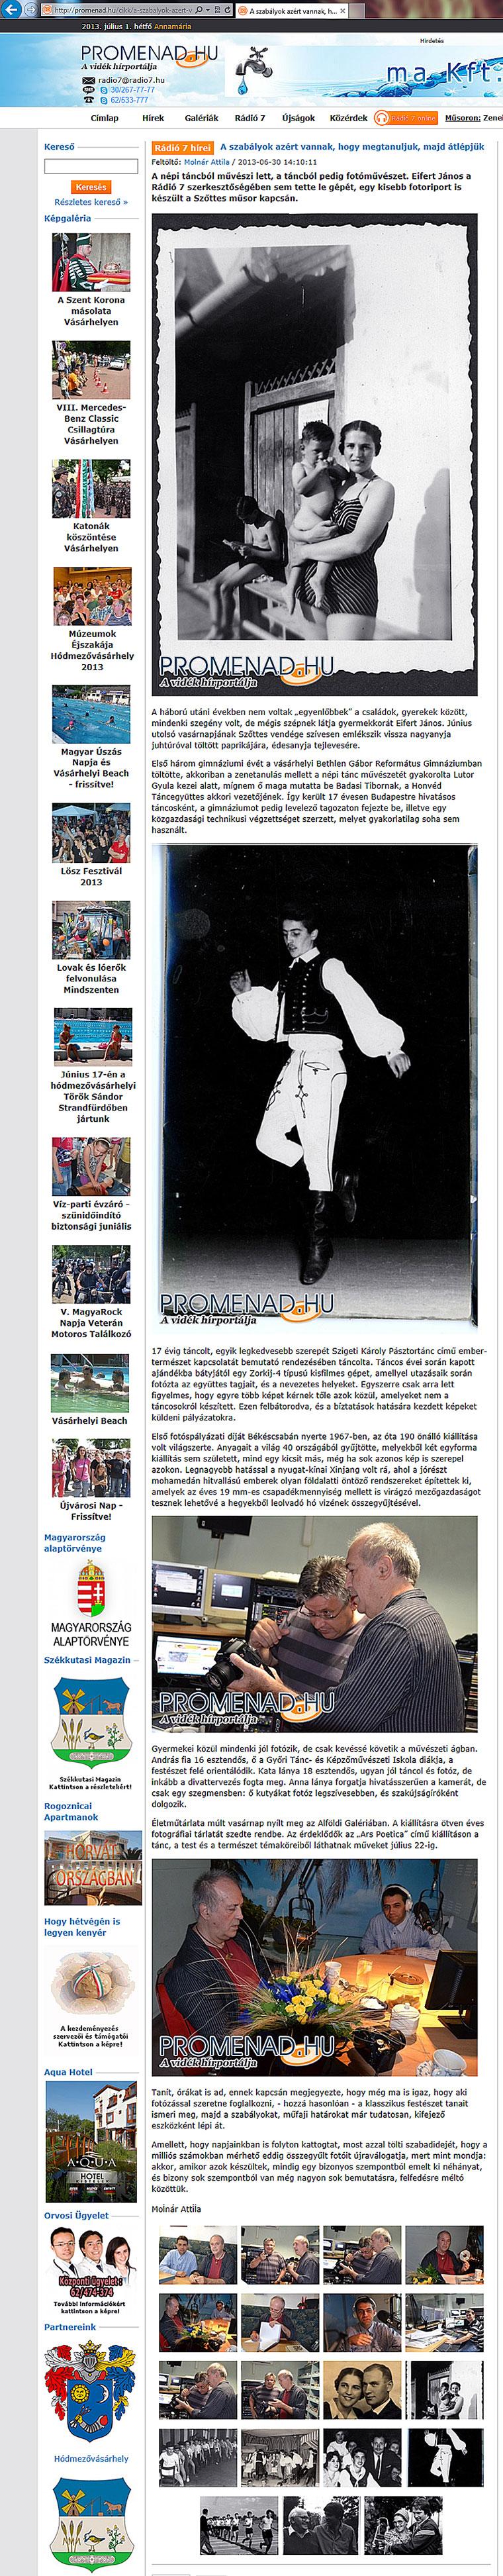 2013.06.30.-Promenad.hu-A-s